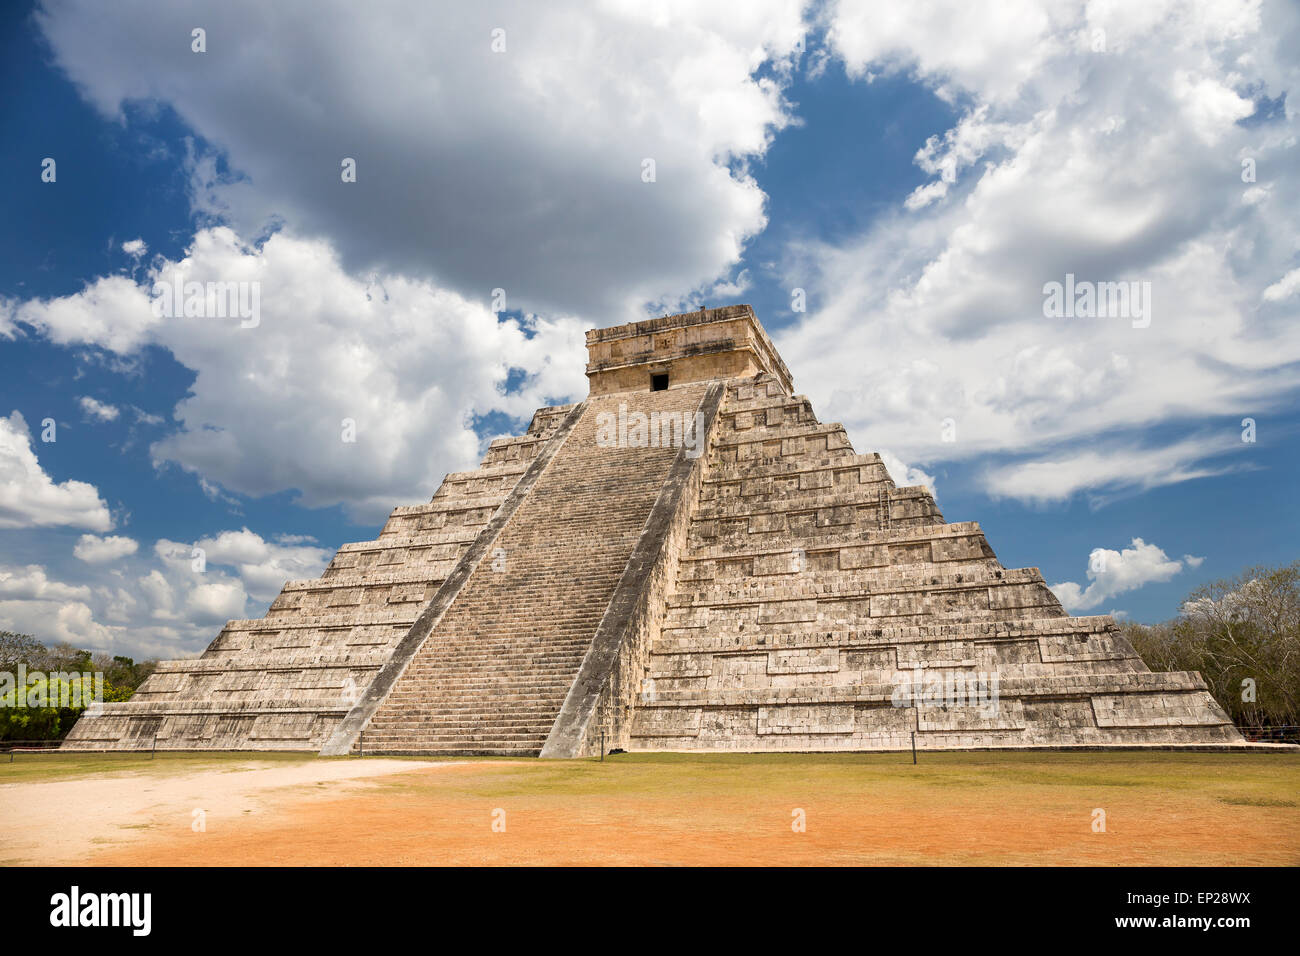 El Castillo (The Kukulkan Temple) of Chichen Itza, mayan pyramid in Yucatan, Mexico Stock Photo